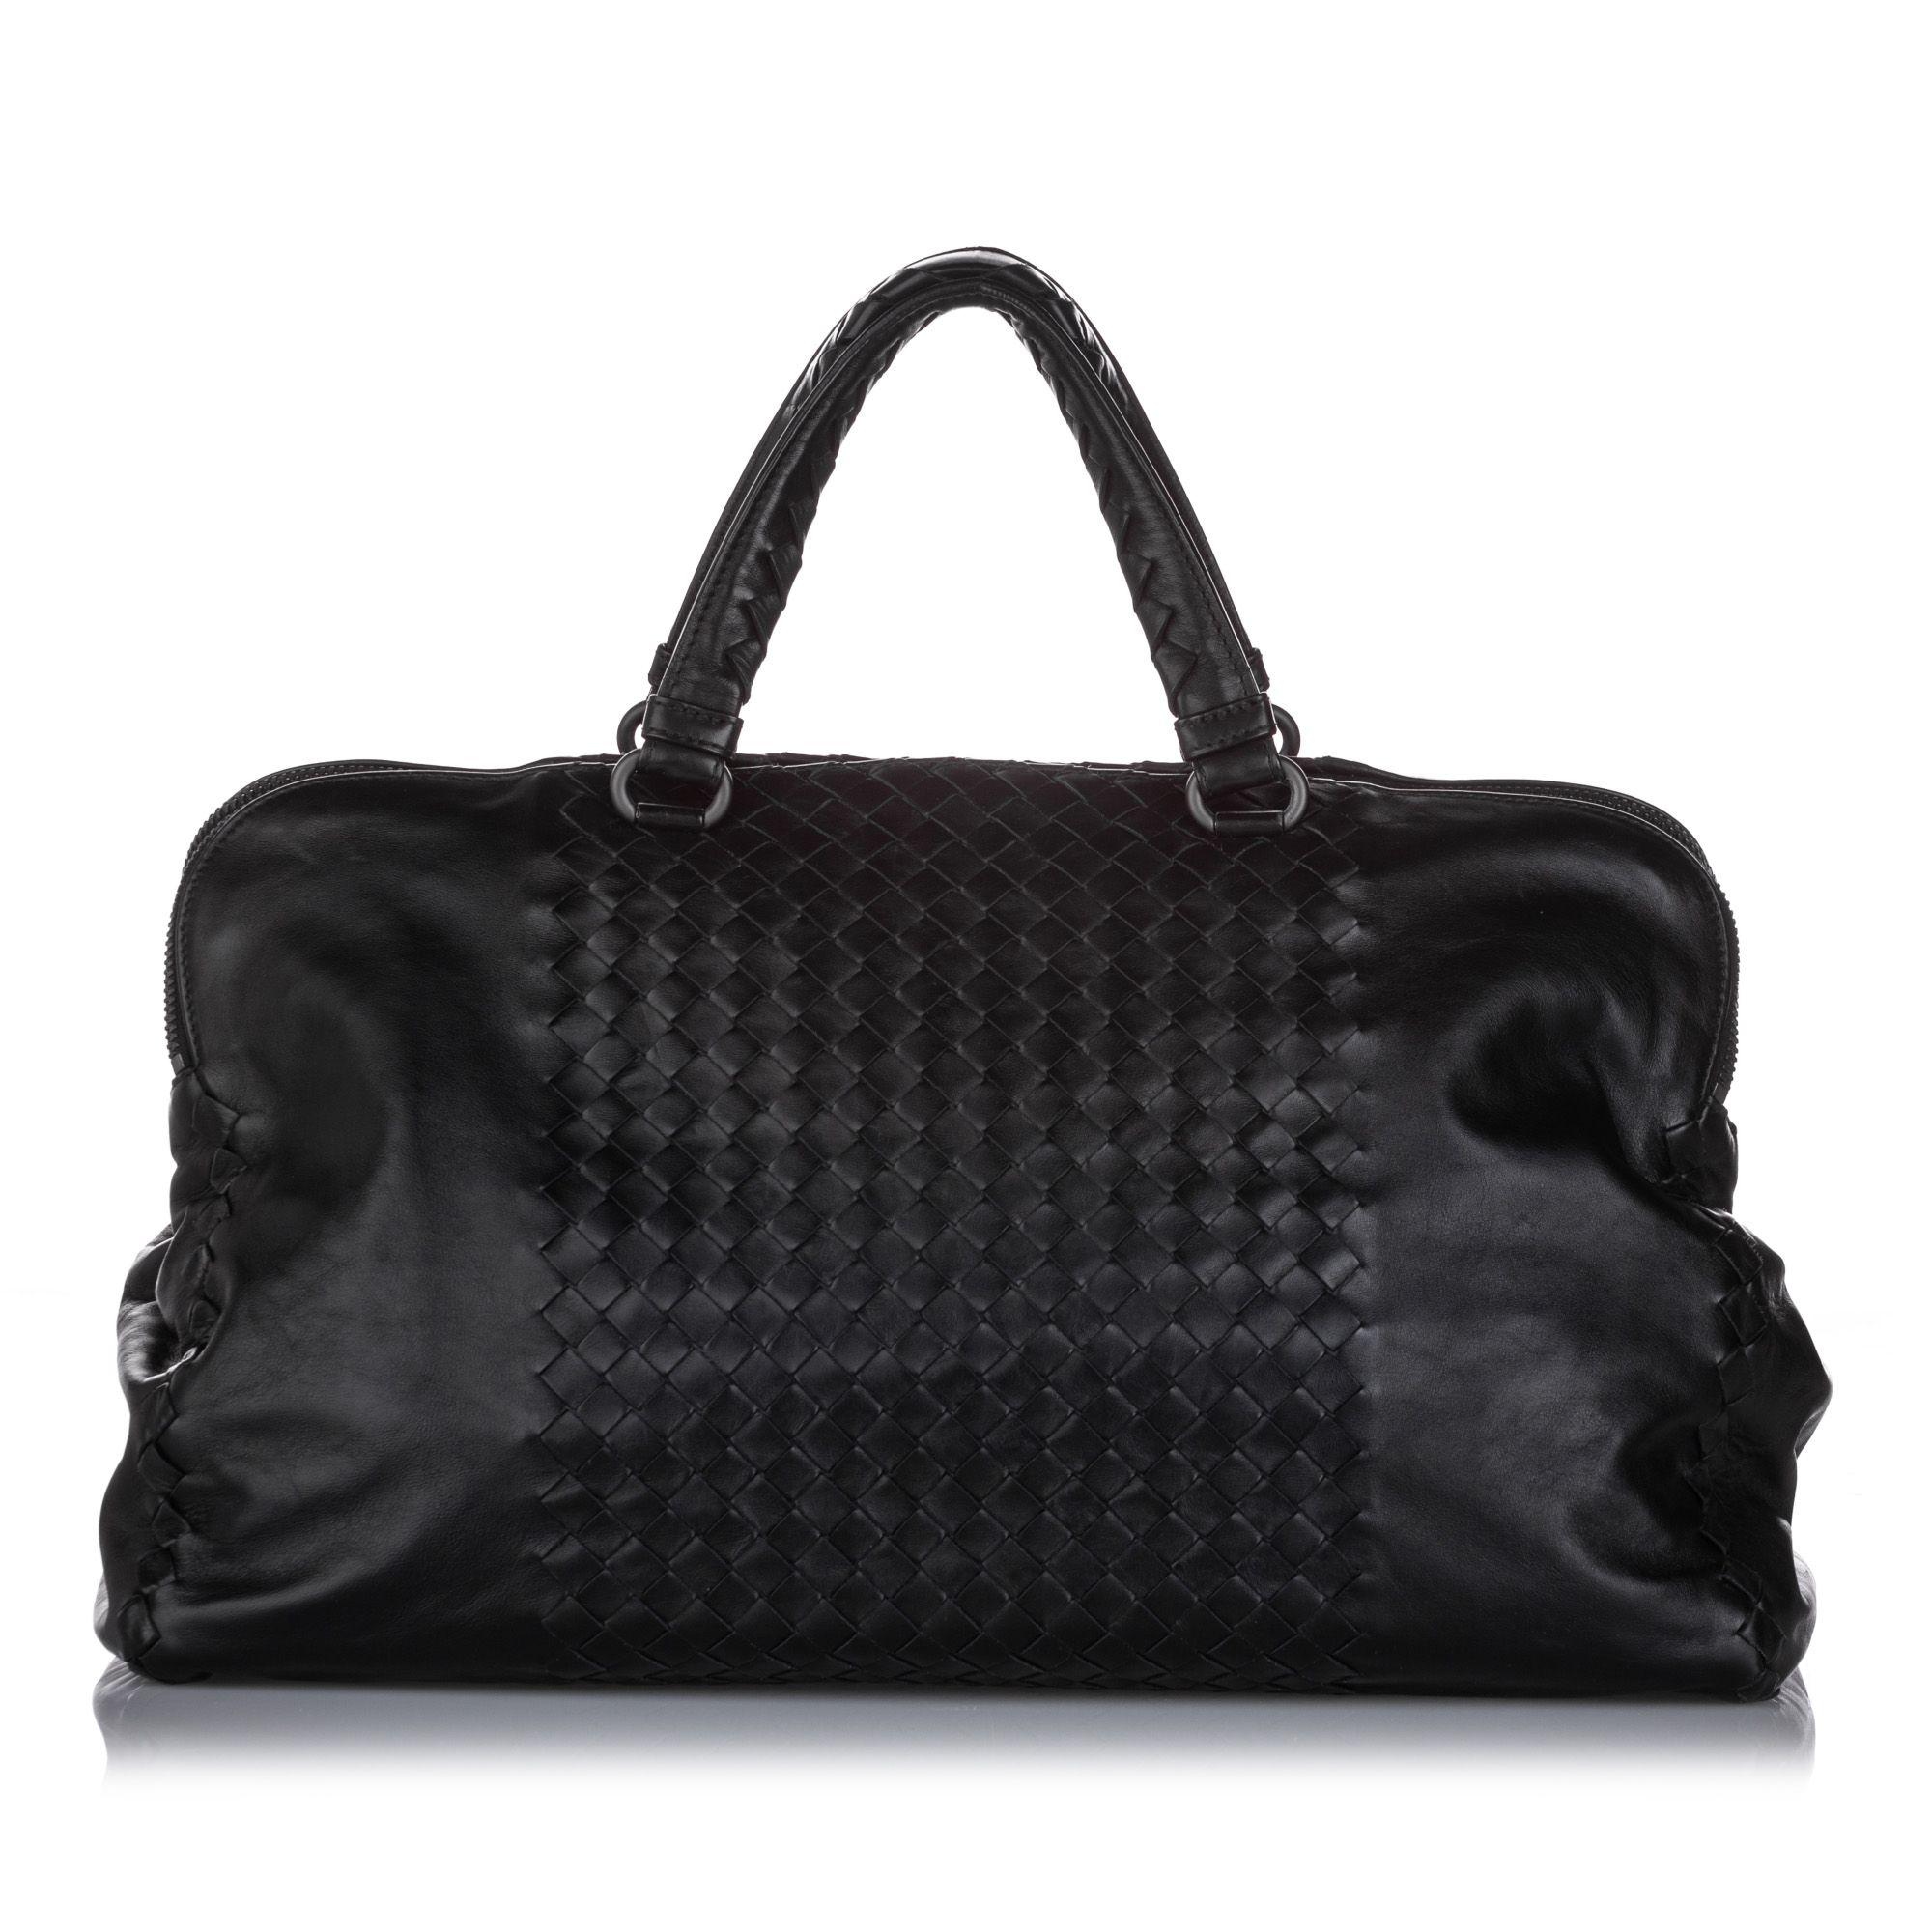 Vintage Bottega Veneta Intrecciato Nappa Leather Satchel Black